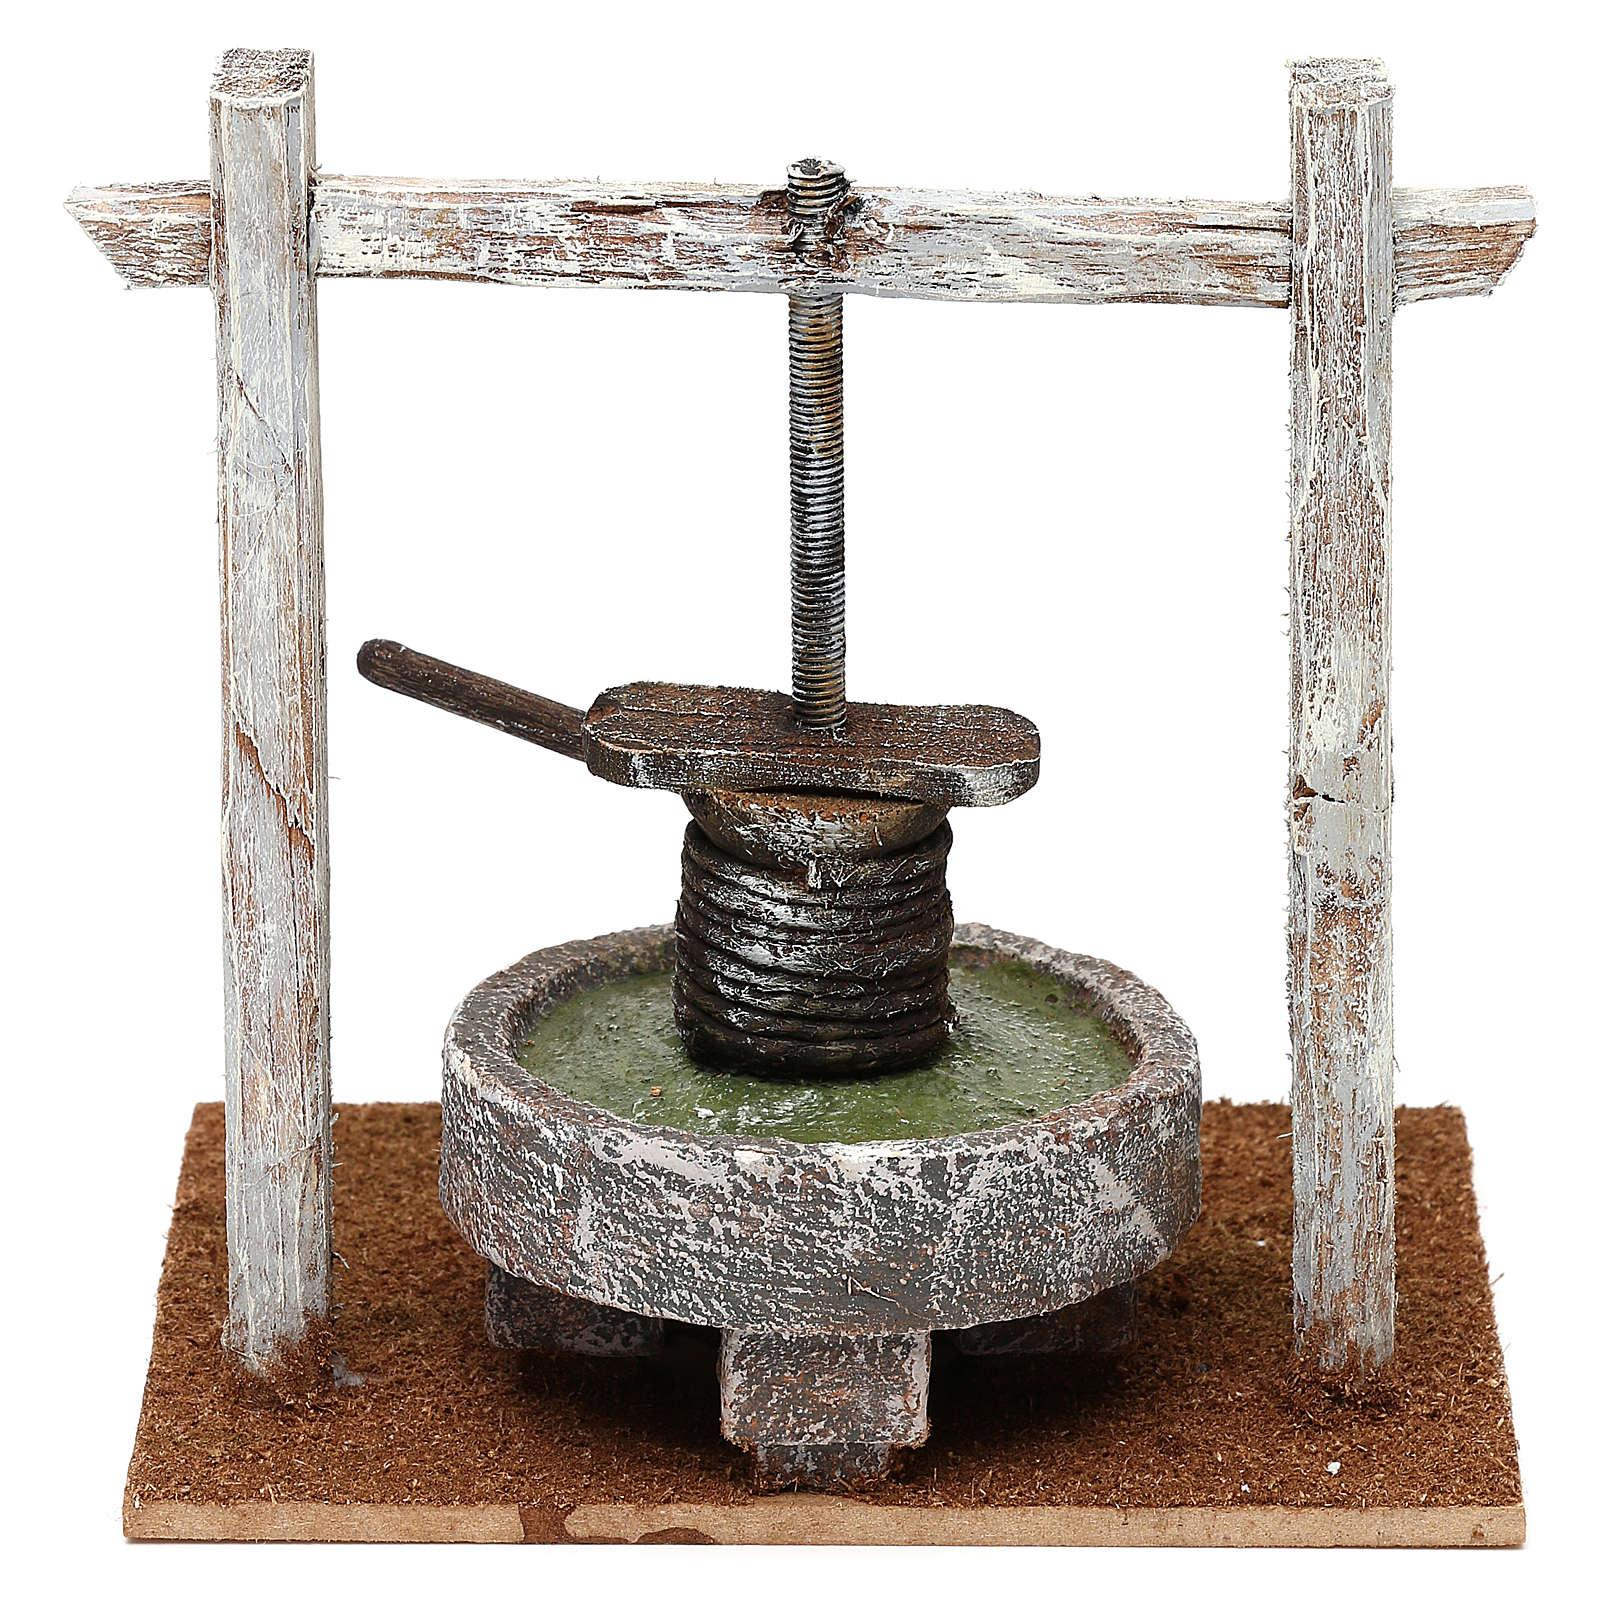 Torchio struttura legno base resina presepe 10 cm 15x15x10 cm 4